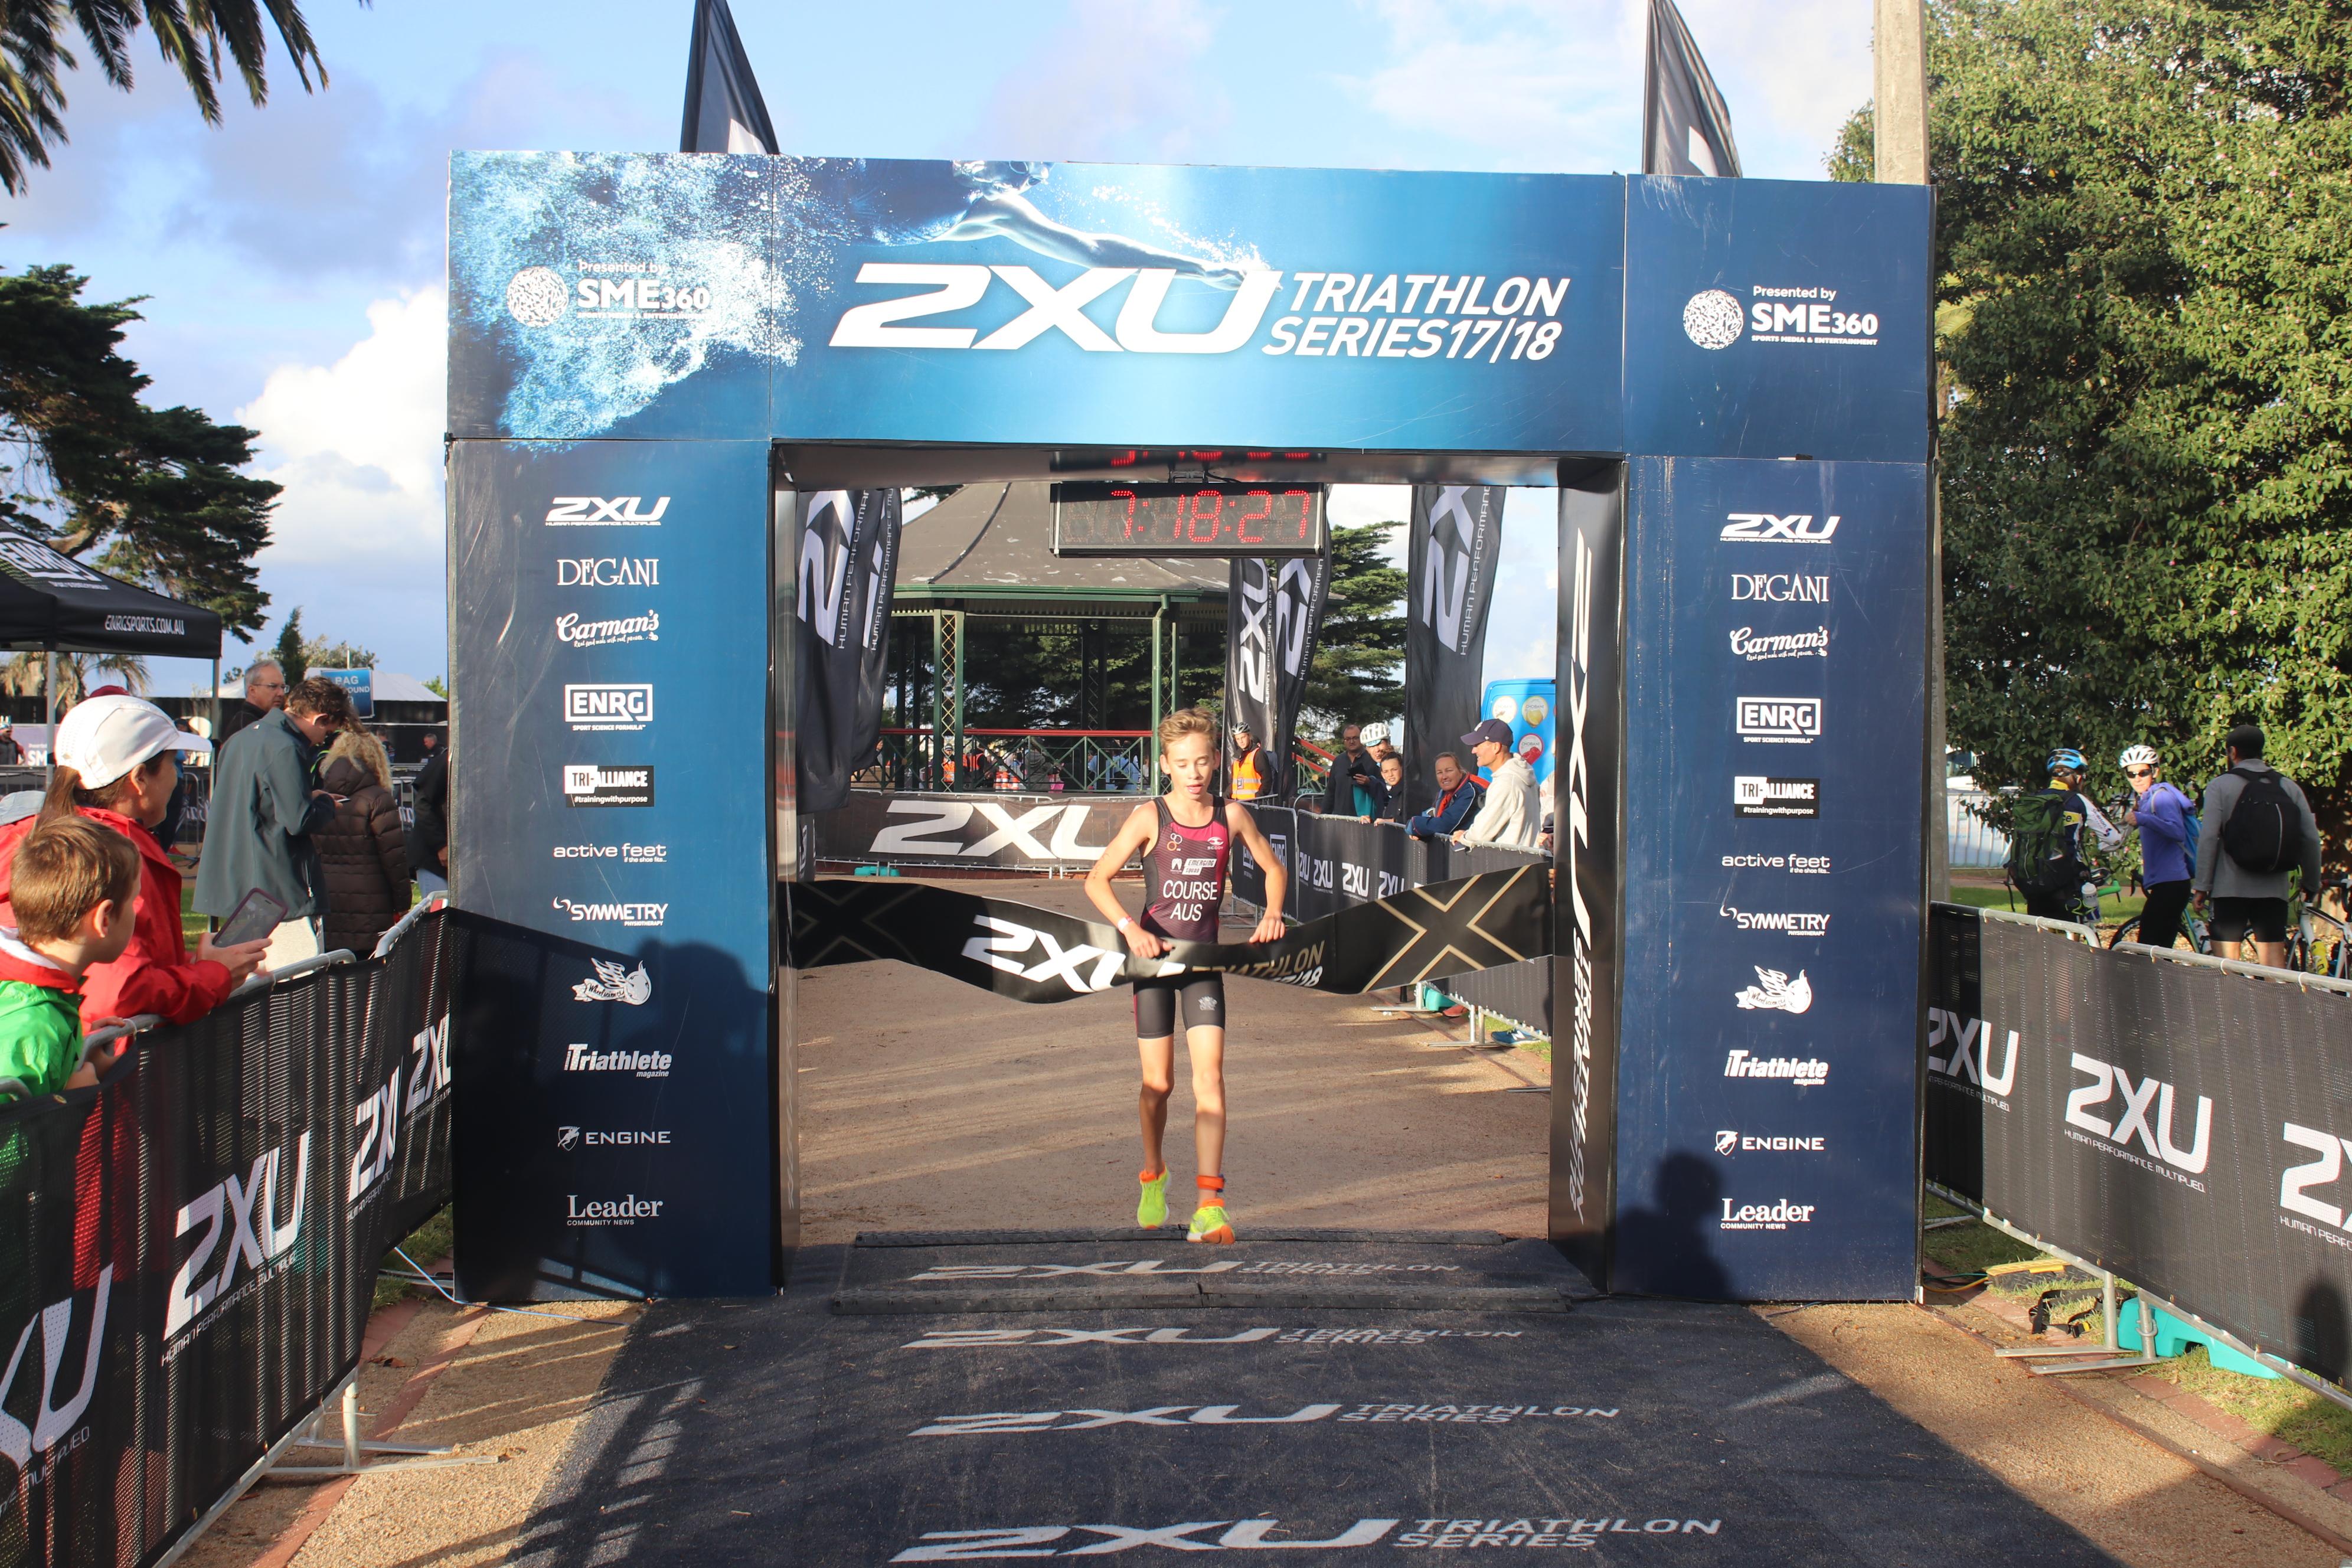 2XU Triathlon Series Race 3